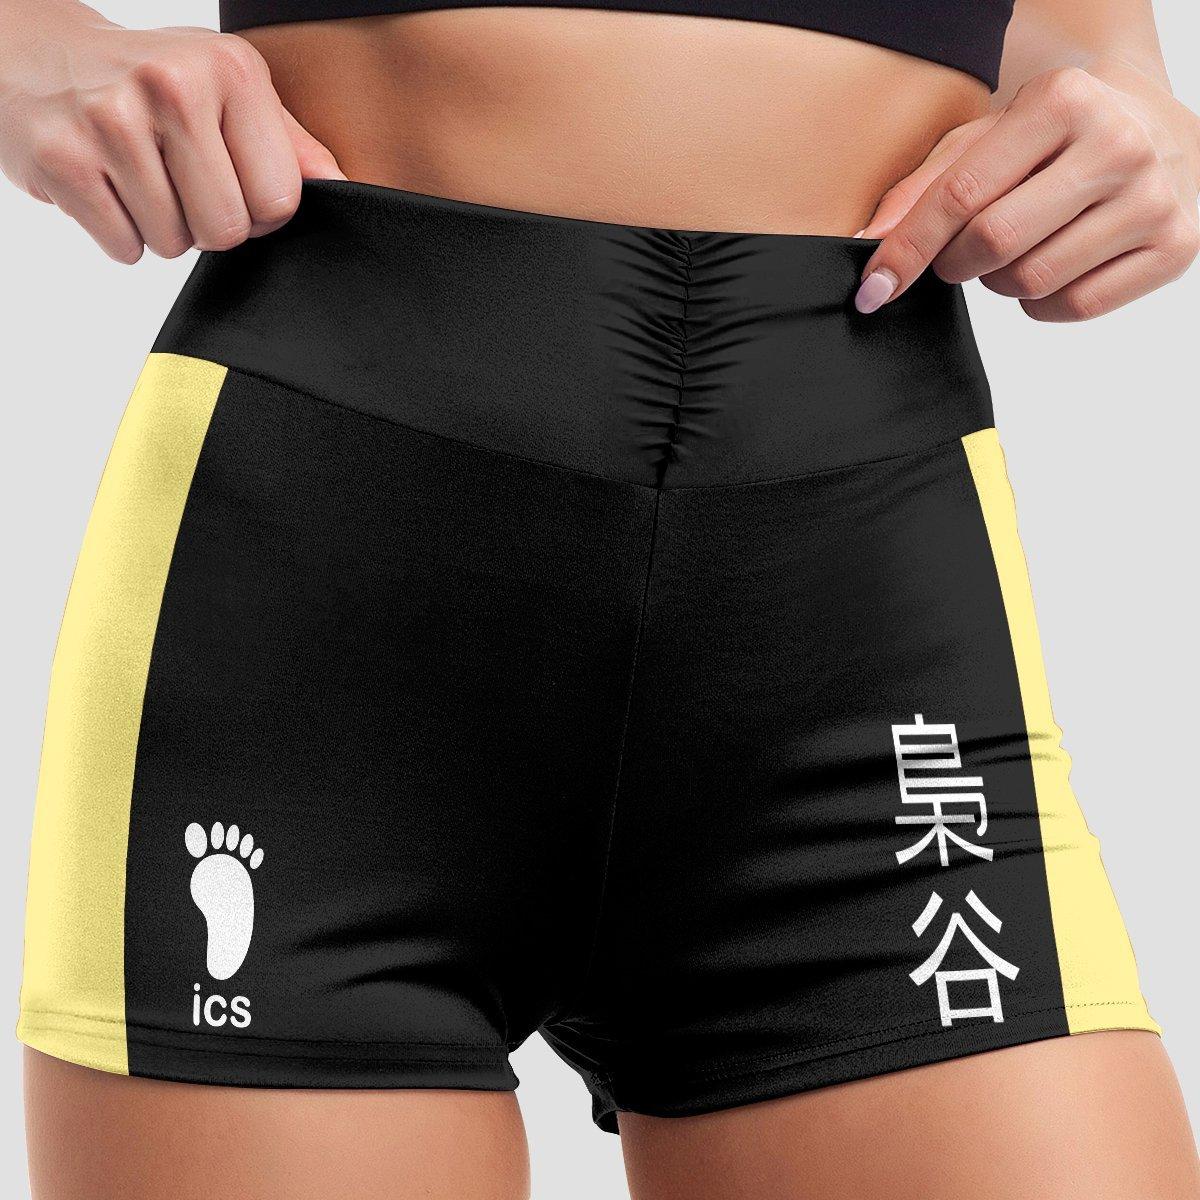 team fukurodani active wear set 804948 - Anime Swimsuits